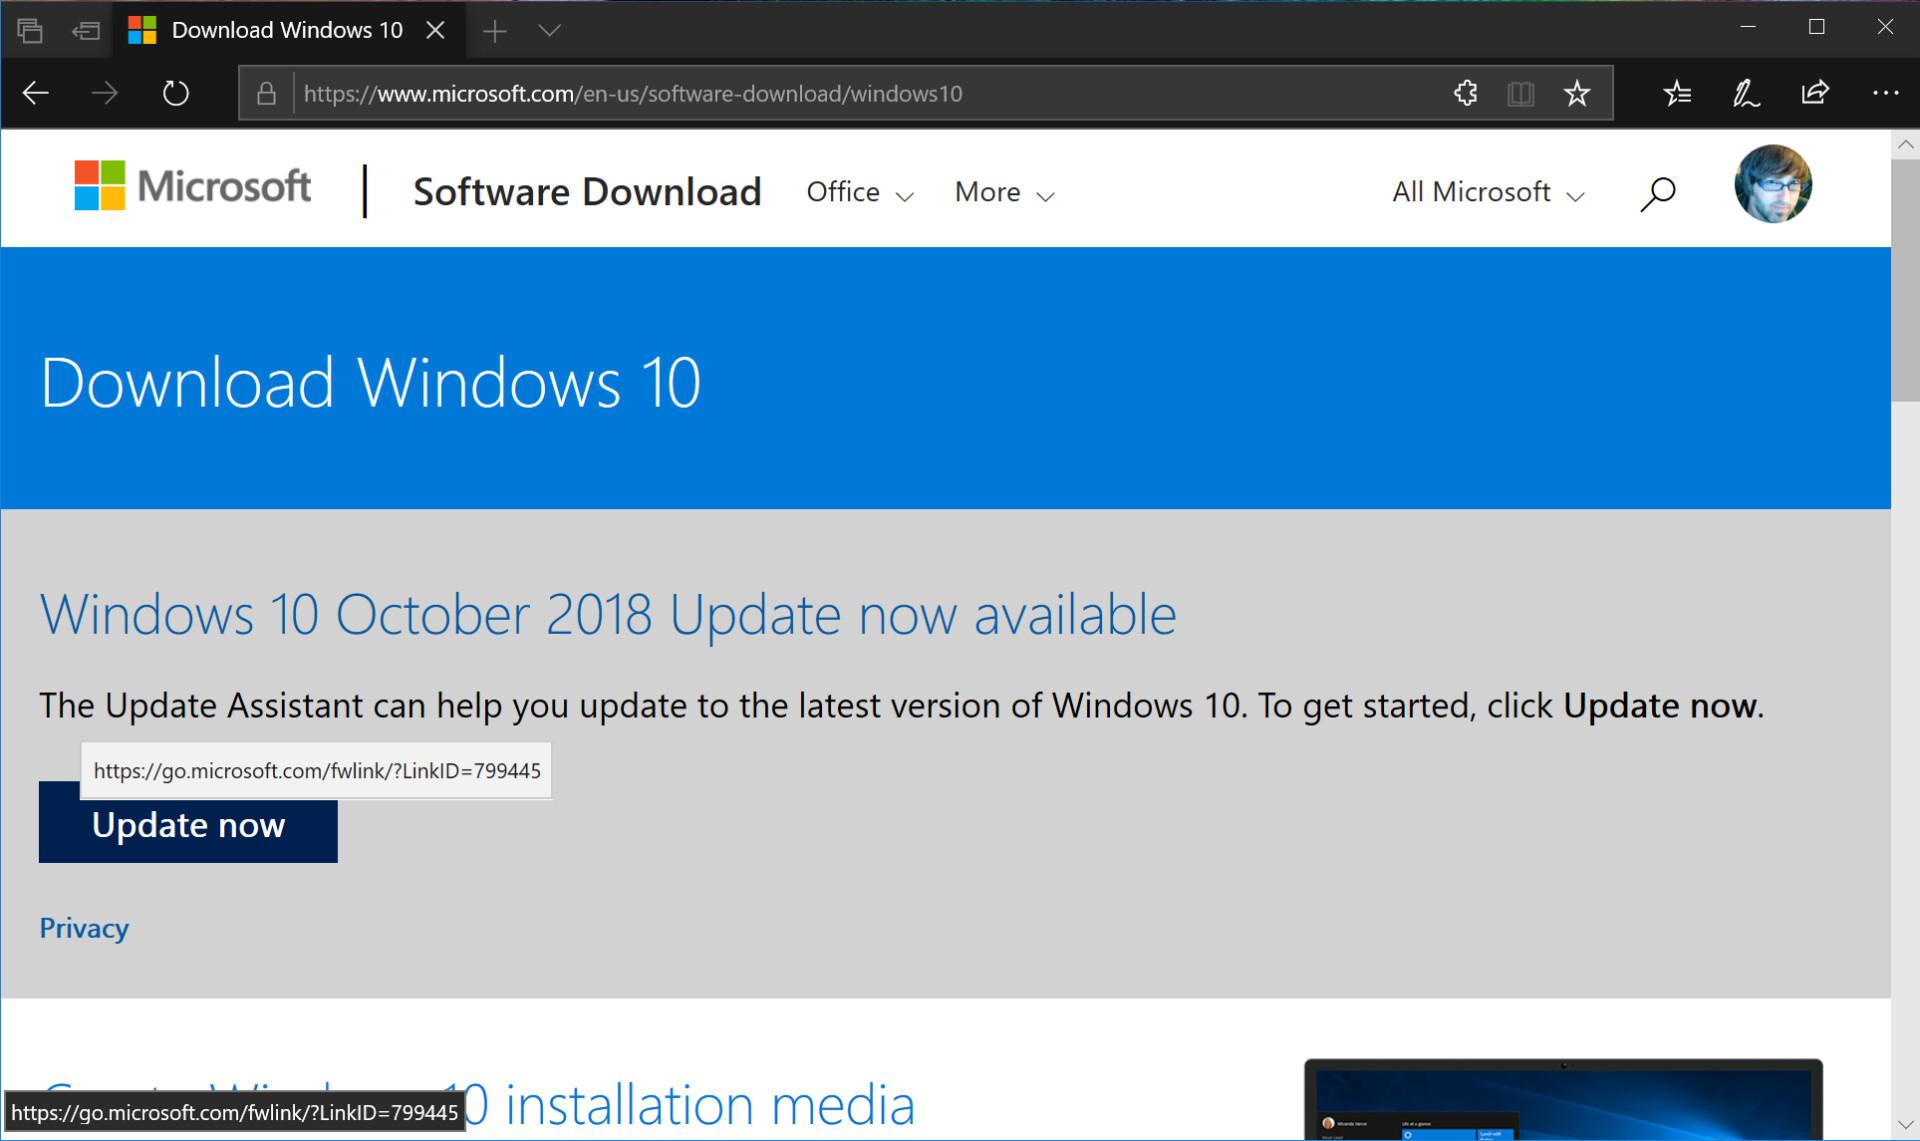 Screenshot of Microsoft Windows 10 update download website.